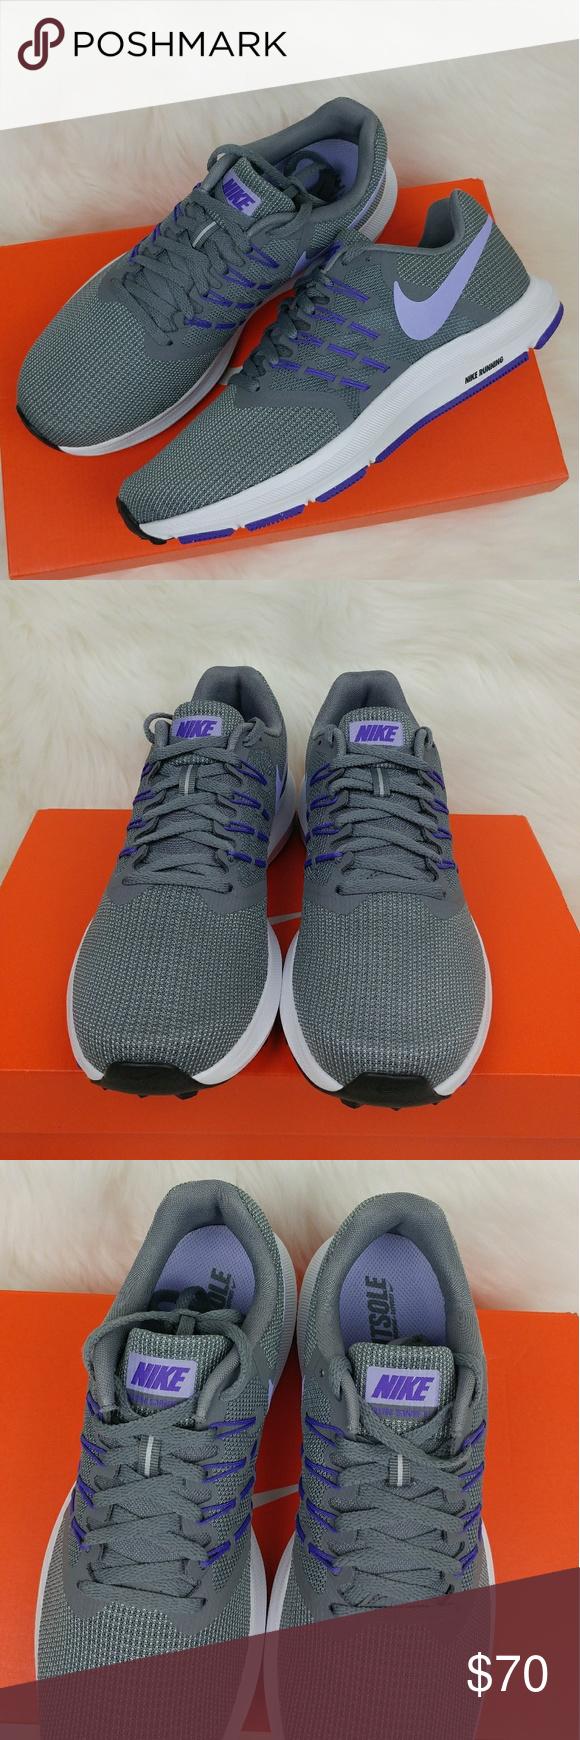 Nike Run Swift womens athletic shoes